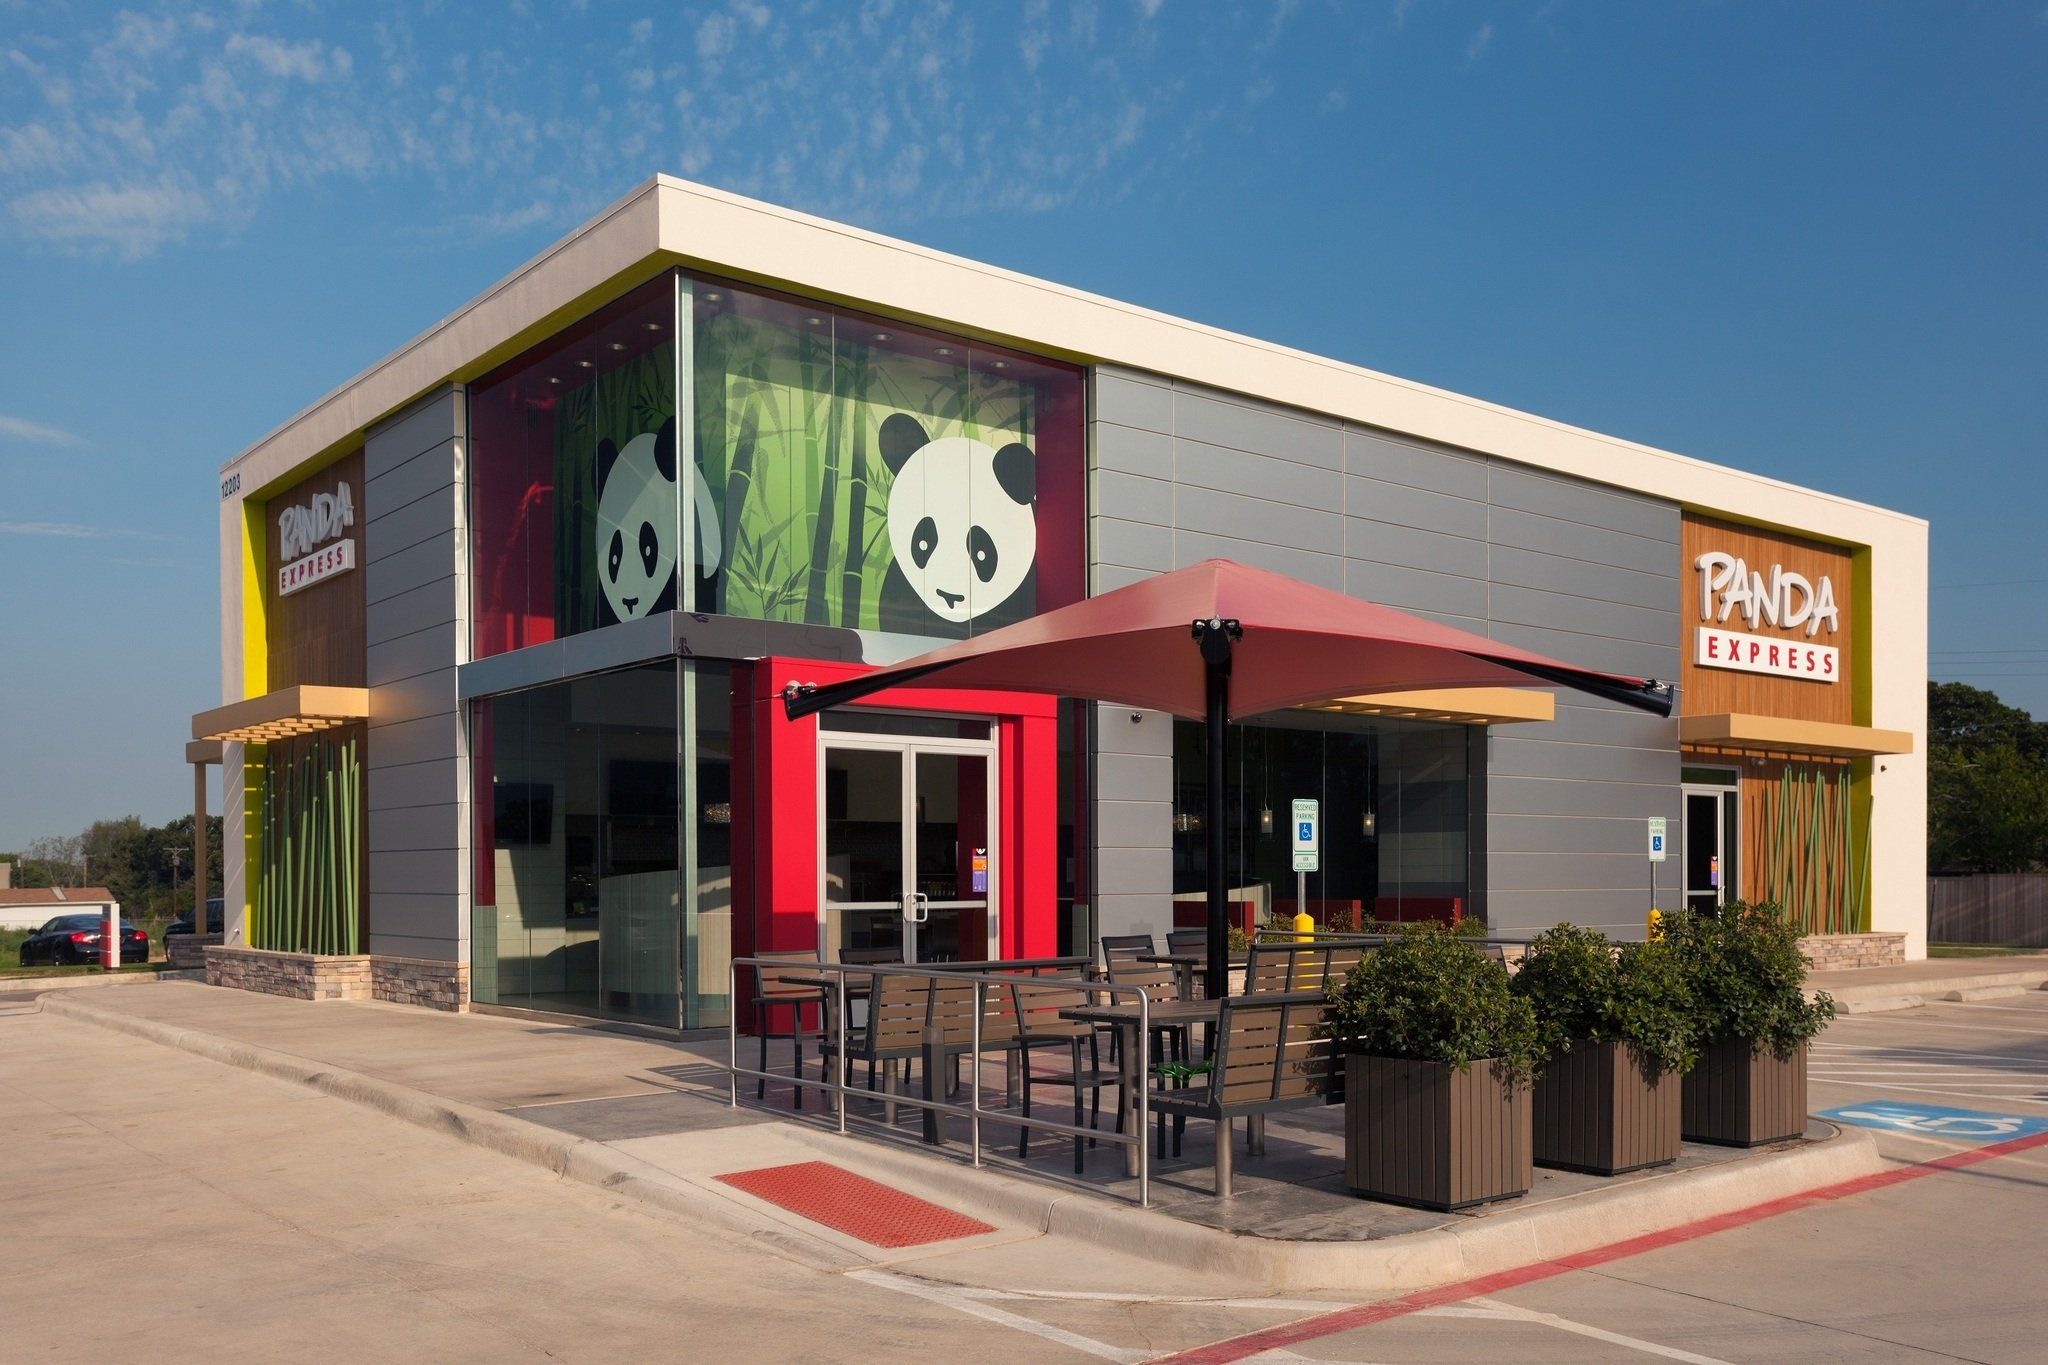 Panda express restaurant project x restaurant exterior - Restaurant exterior design ideas ...